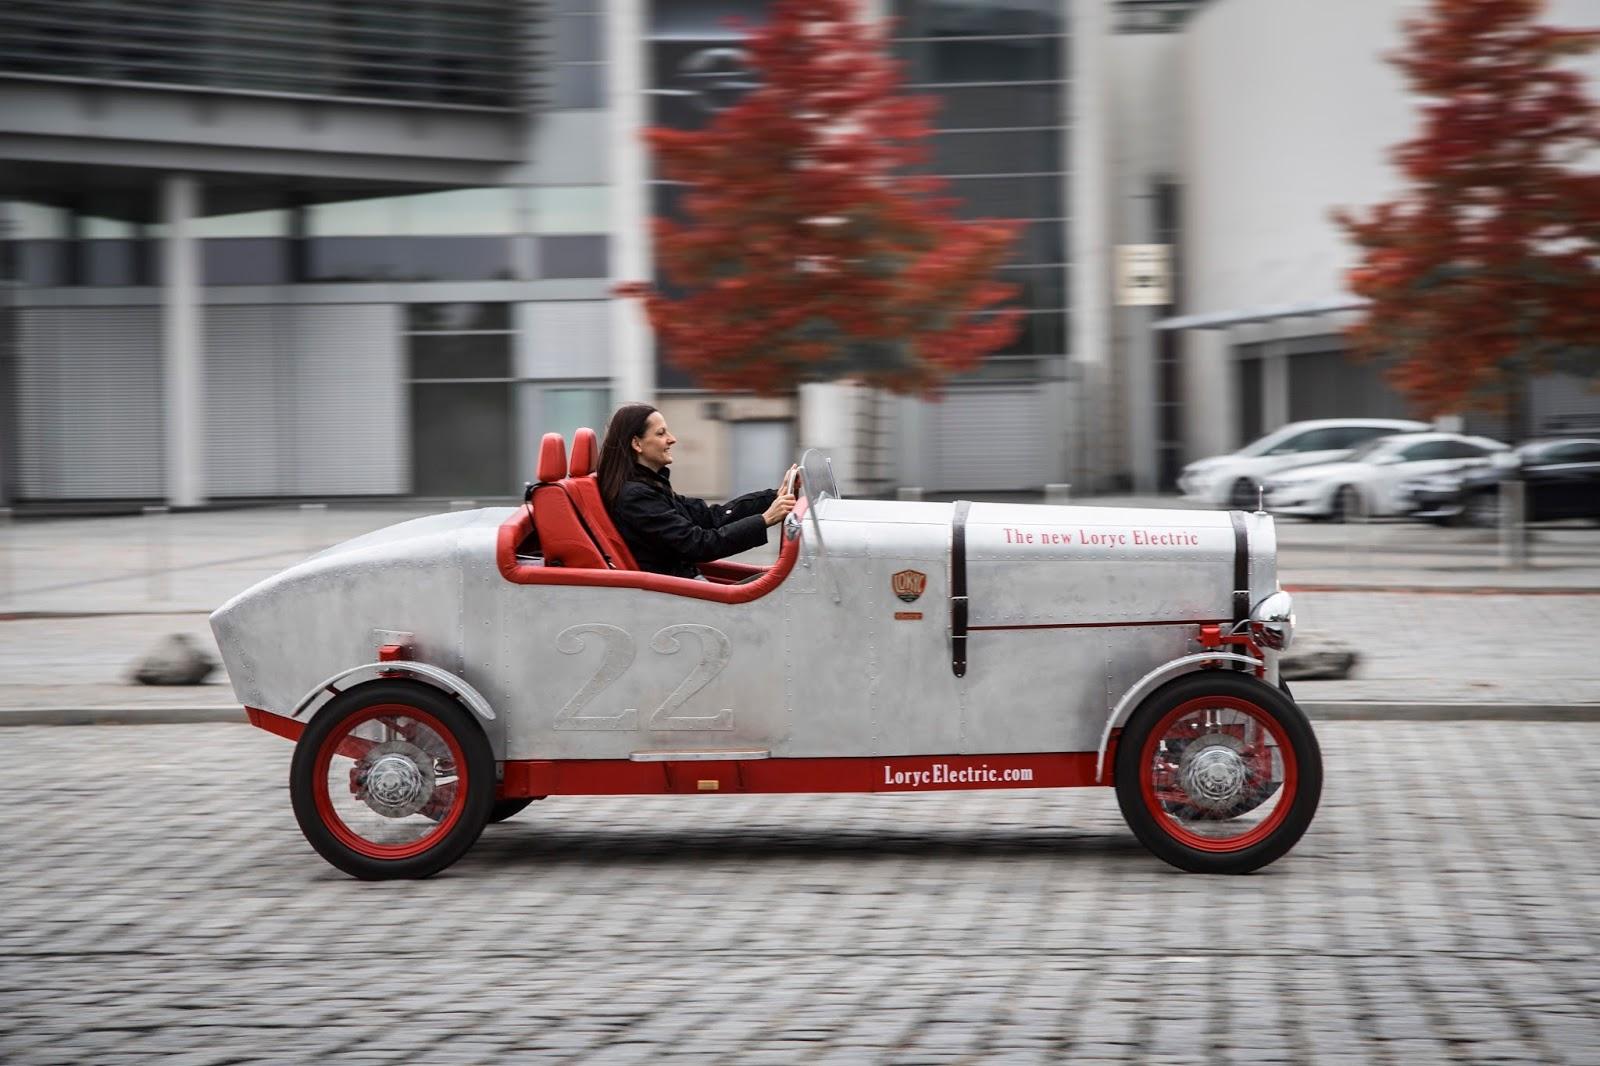 Loryc Electric Speedster 303792 Το Opel Adam δωρίζει τα εξαρτημάτα του και δίνει ζωή στο Loryc Electric Speedster Electric cars, Loryc, Opel, Opel ADAM